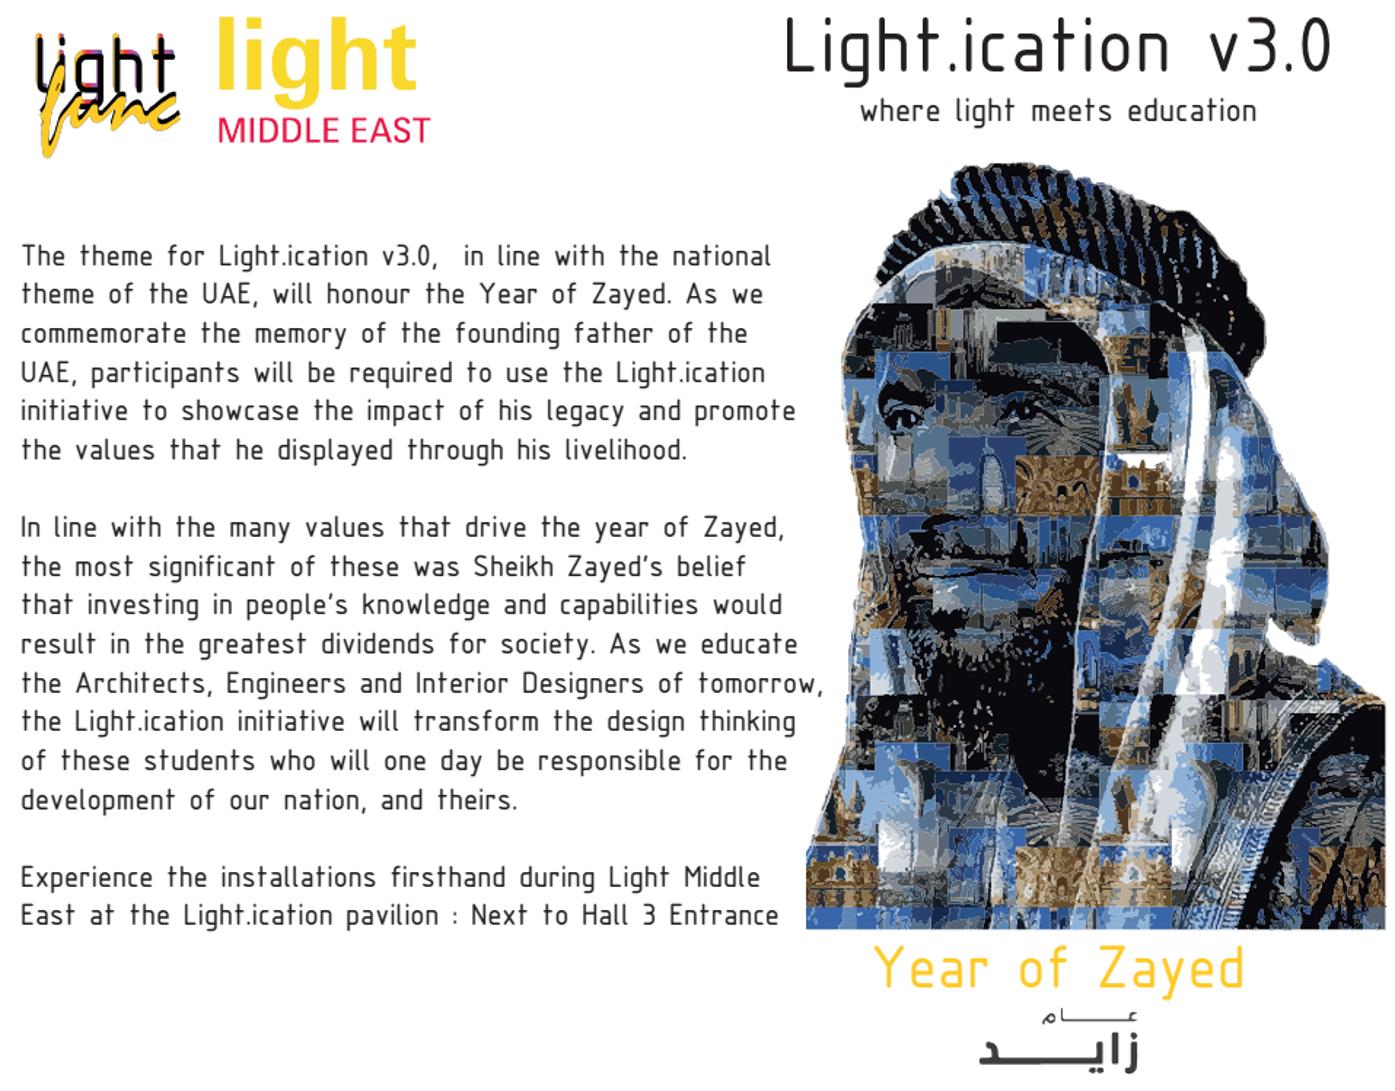 Light.ication Poster